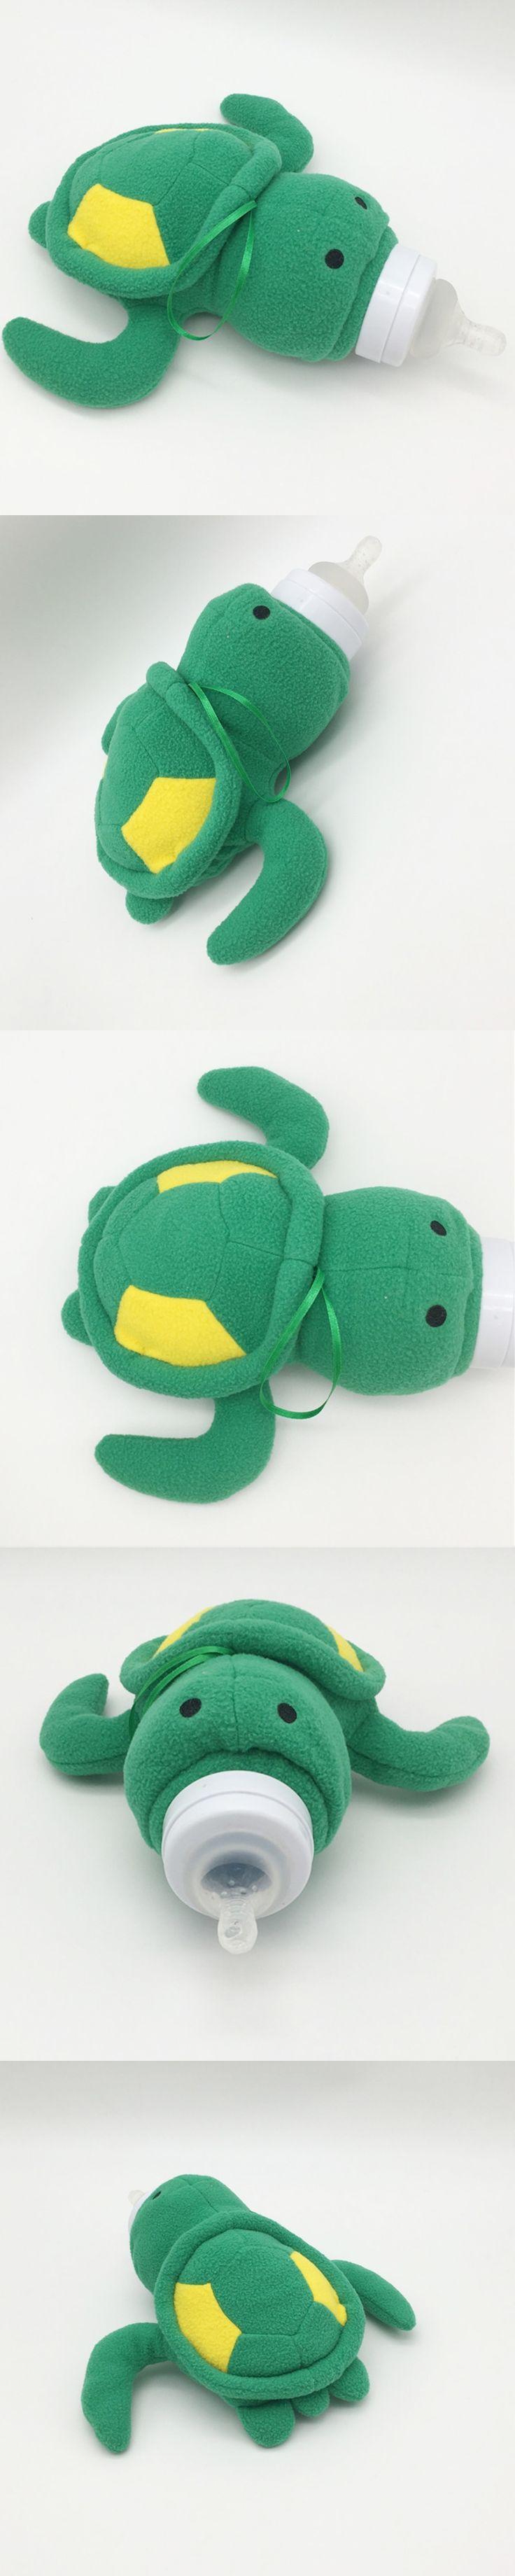 Cute Green Turtle Baby Feeding Bottle Bag//Baby Bottle Case Baby Bottle Huggers/Baby Feeder Cover/Infant&Toddler's Plush Toys